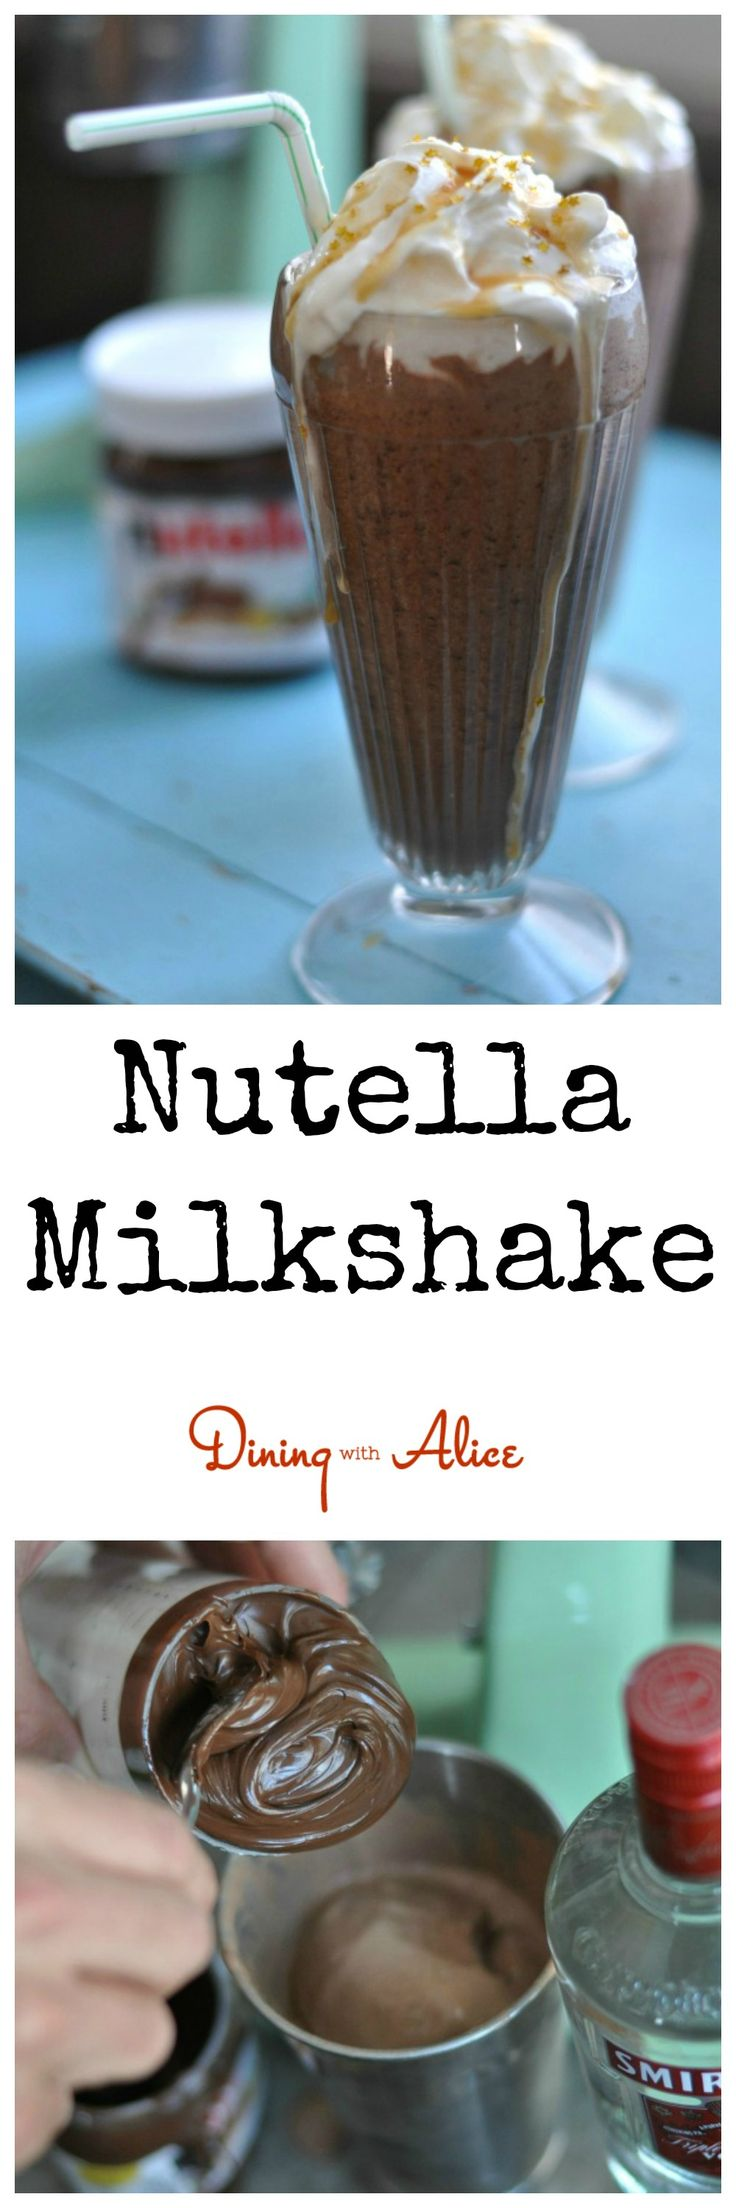 Nutella Milkshake Recipe here: http://diningwithalice.com/desserts/nutella-milkshake/ #nutella #milkshake